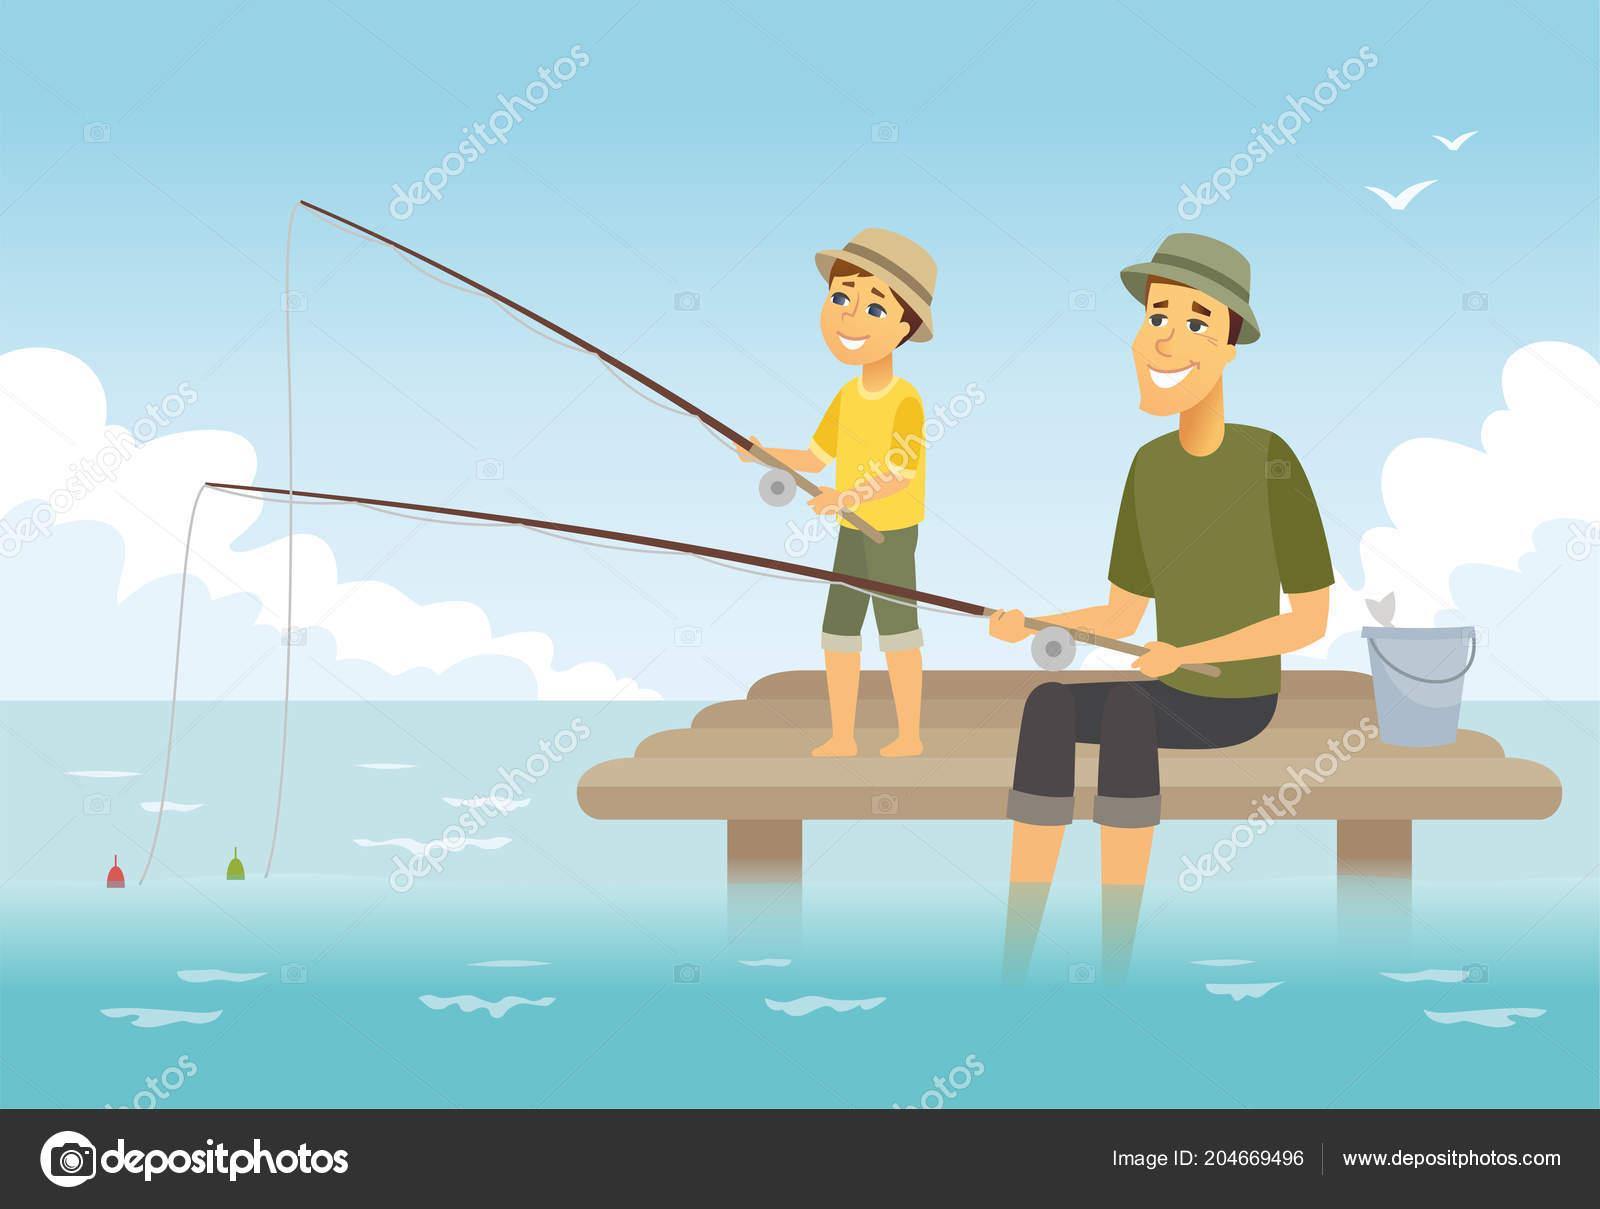 Lắng nghe lời thì thầm của trái tim  Depositphotos_204669496-stock-illustration-father-and-son-fishing-cartoon